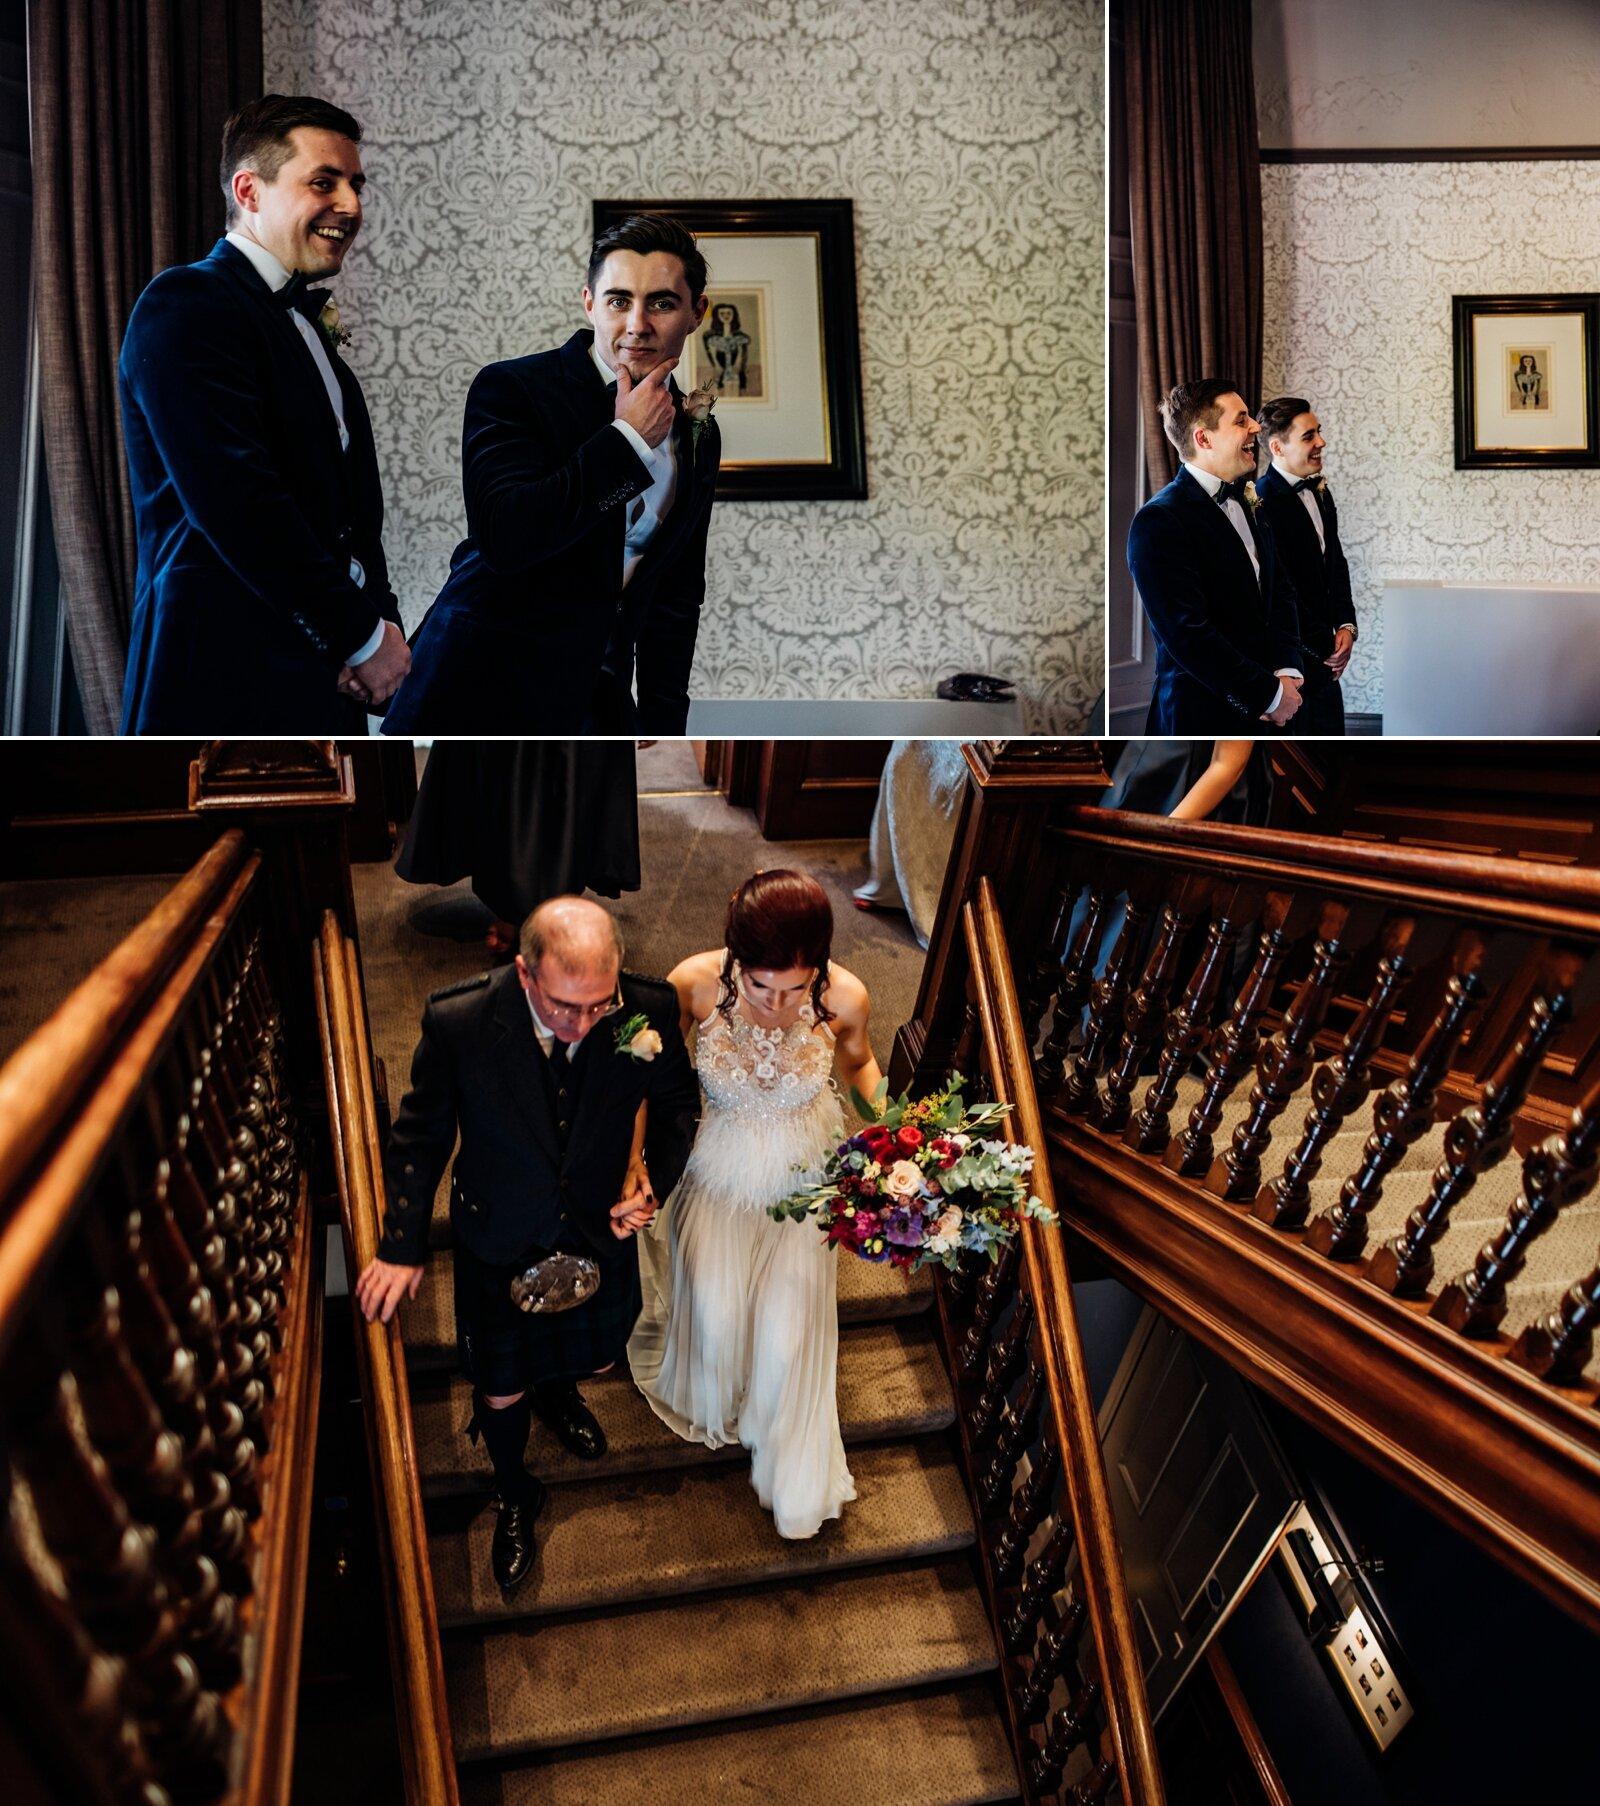 Andy&Szerdi-Photography_Ceremony_Elaine-Stephen-3.jpg